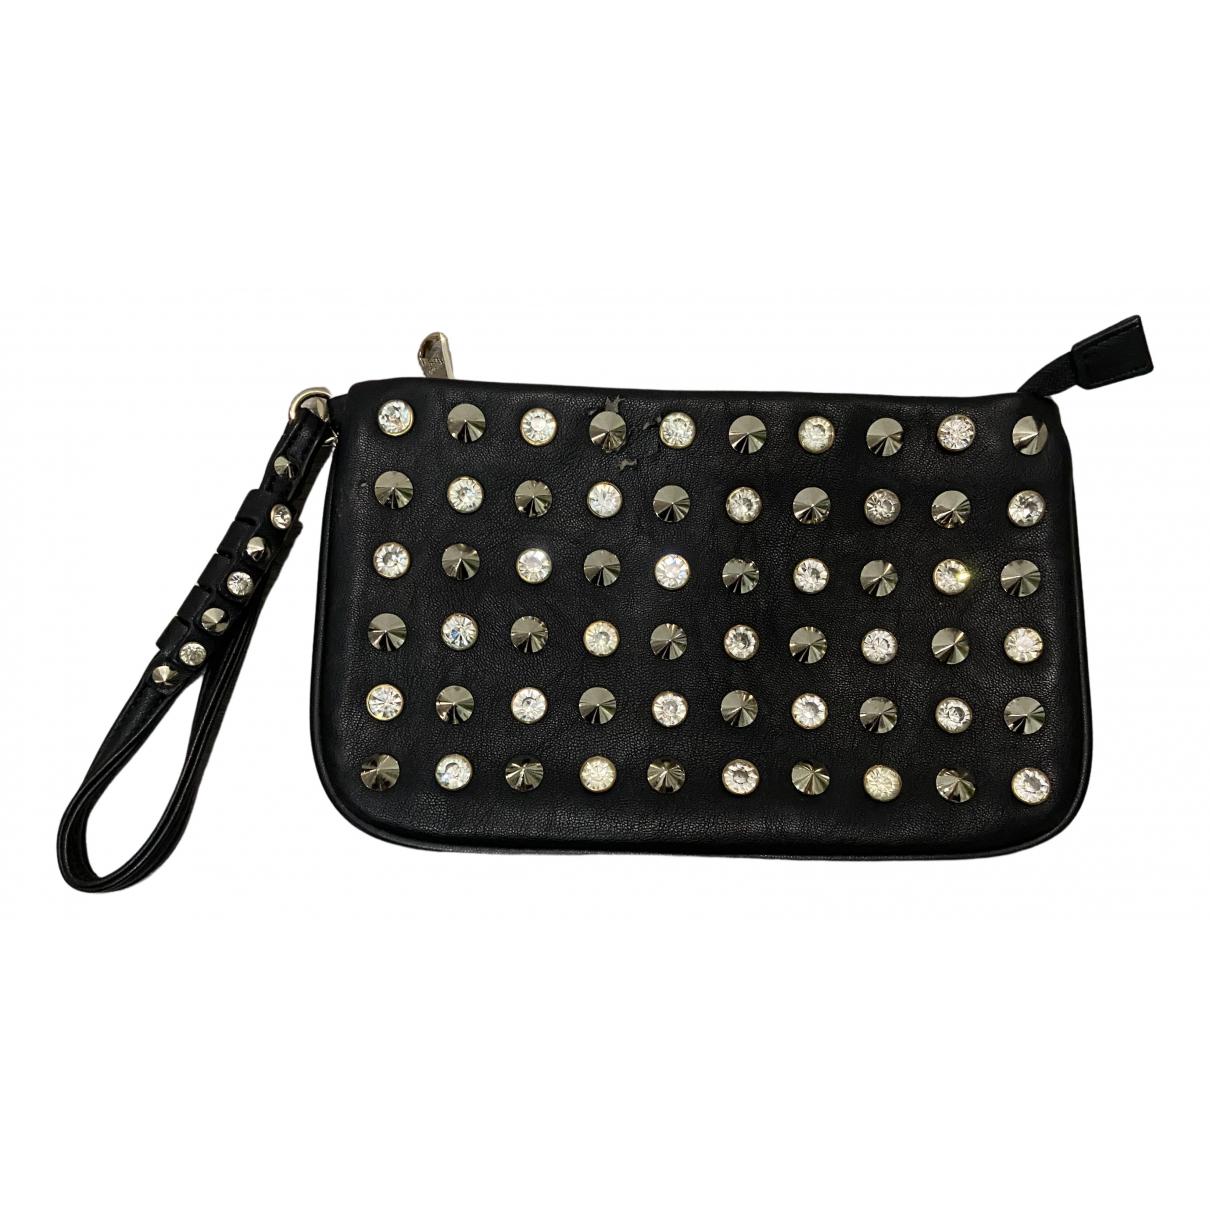 Patrizia Pepe N Black Leather Clutch bag for Women N